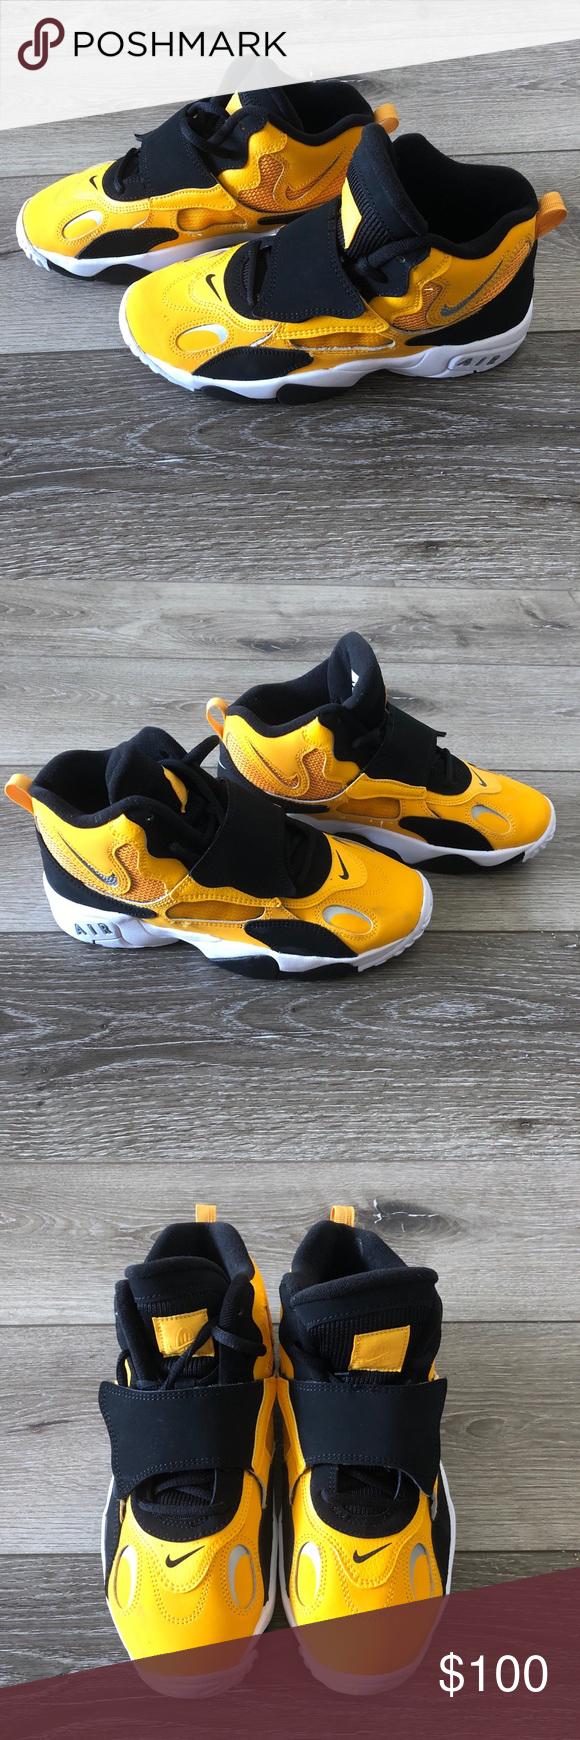 Nike Air Max Speed Turf Big Kids Shoe